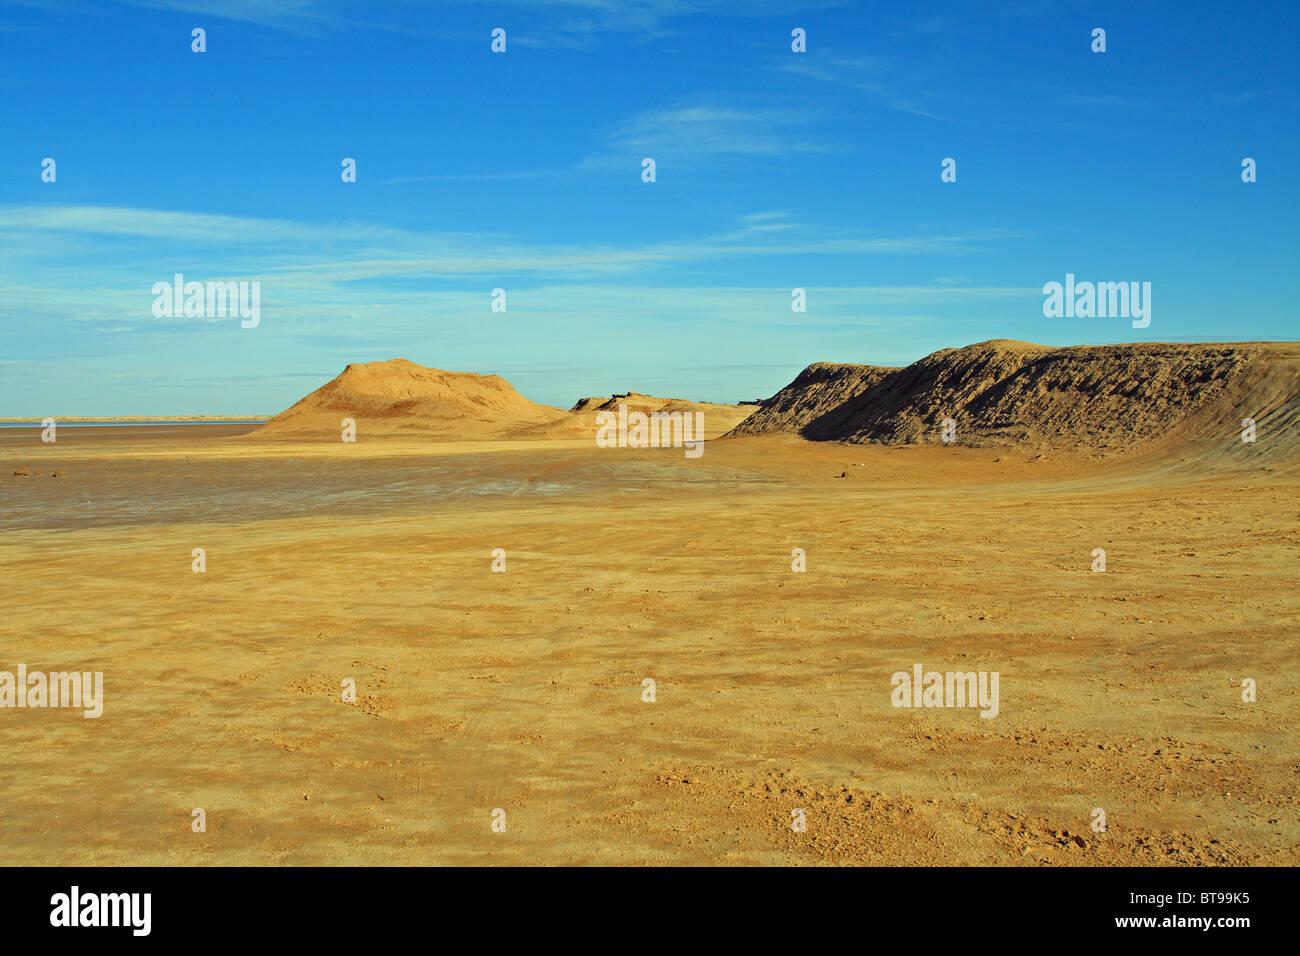 Landscape of the Chott El Gharsa, Sahara Desert, near Tozeur, western Tunisia - Stock Image